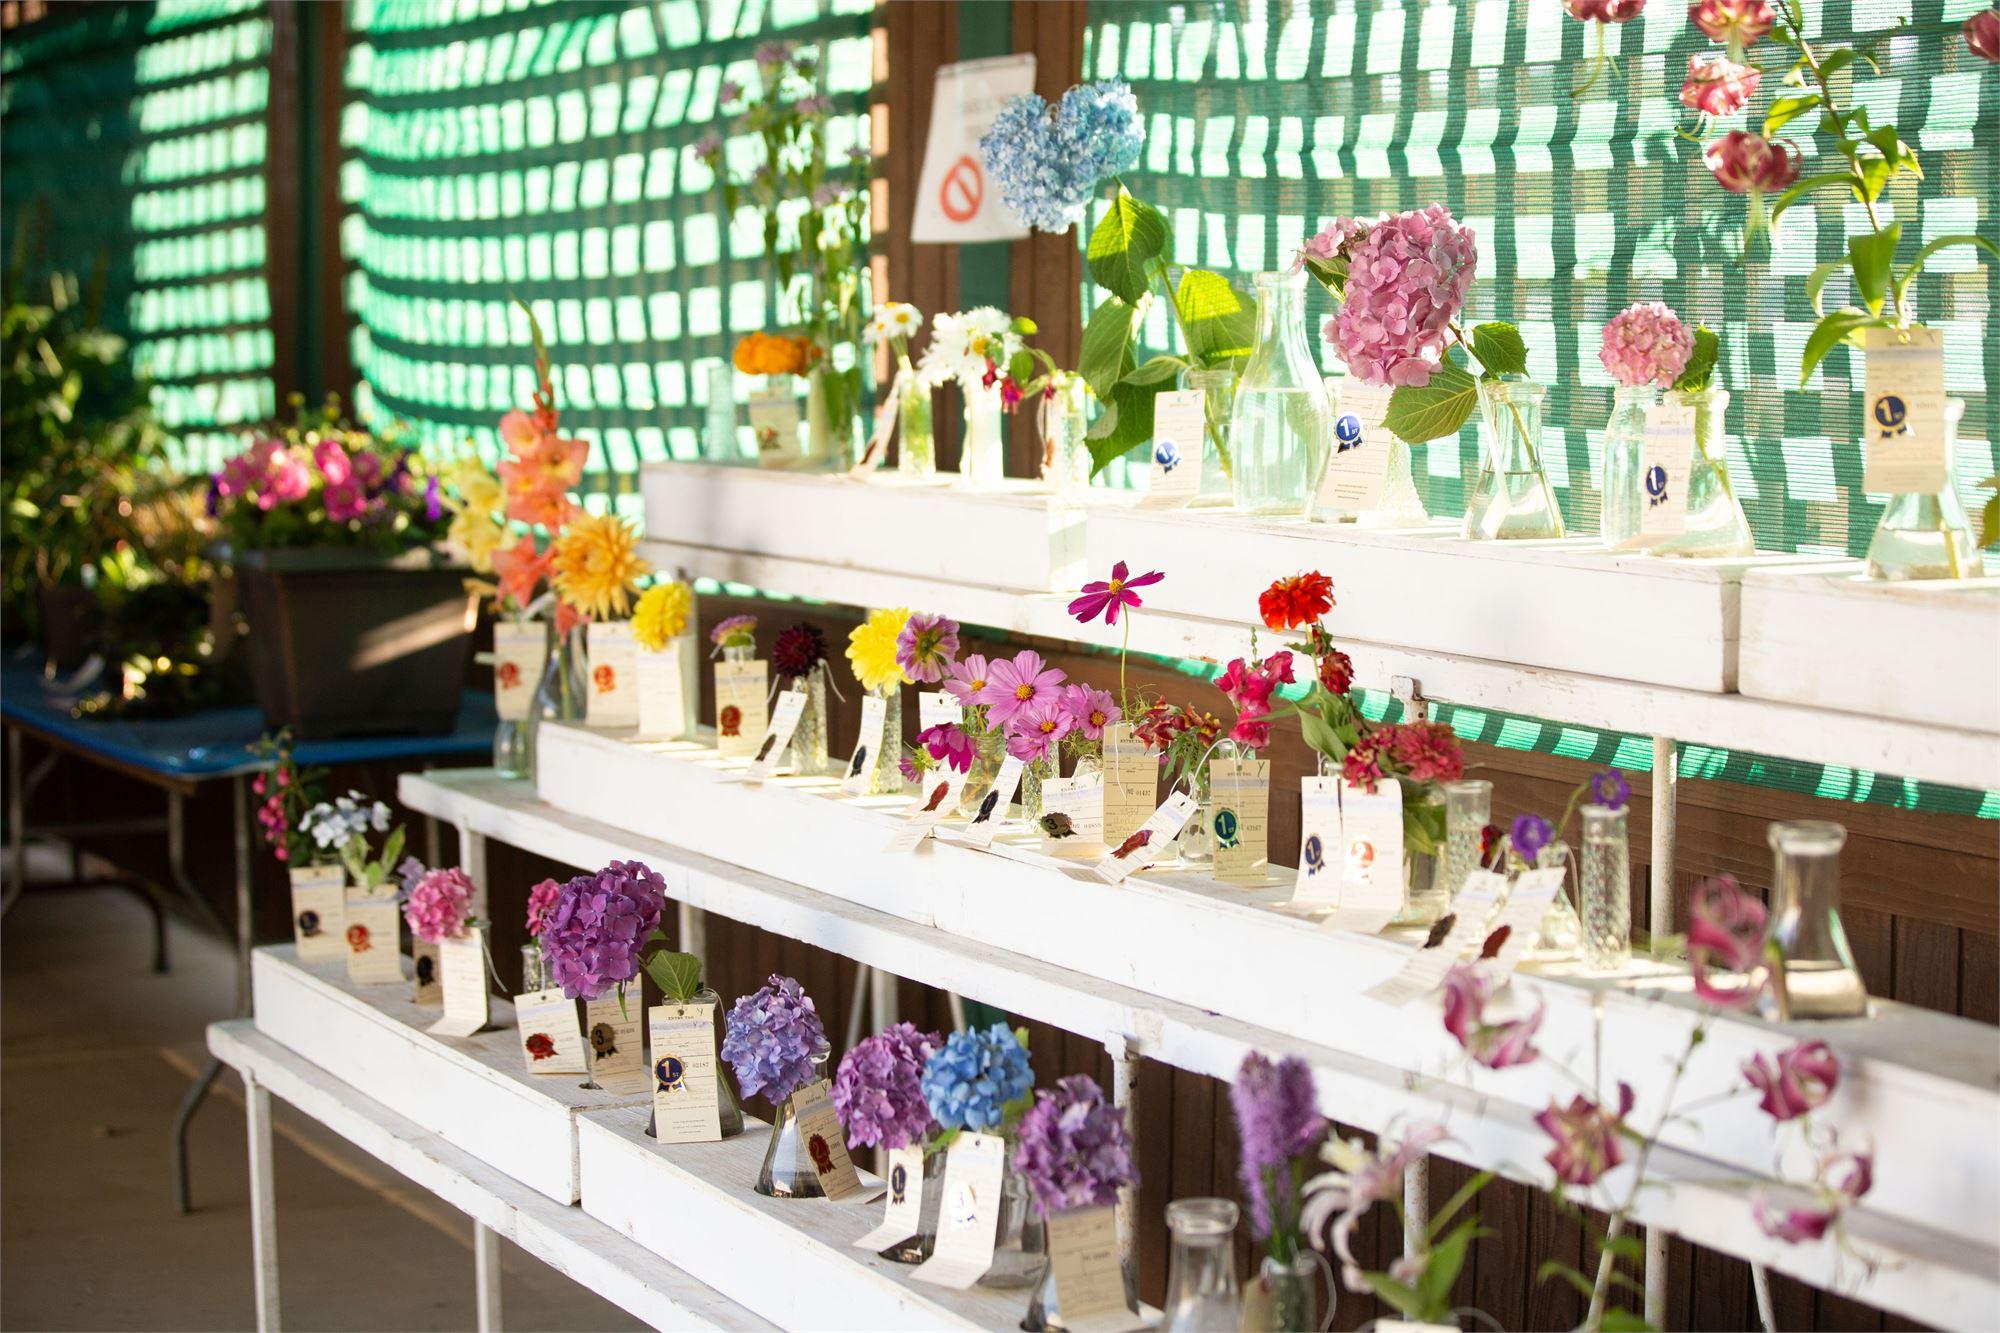 Photo: shelves of flowers in vases for show